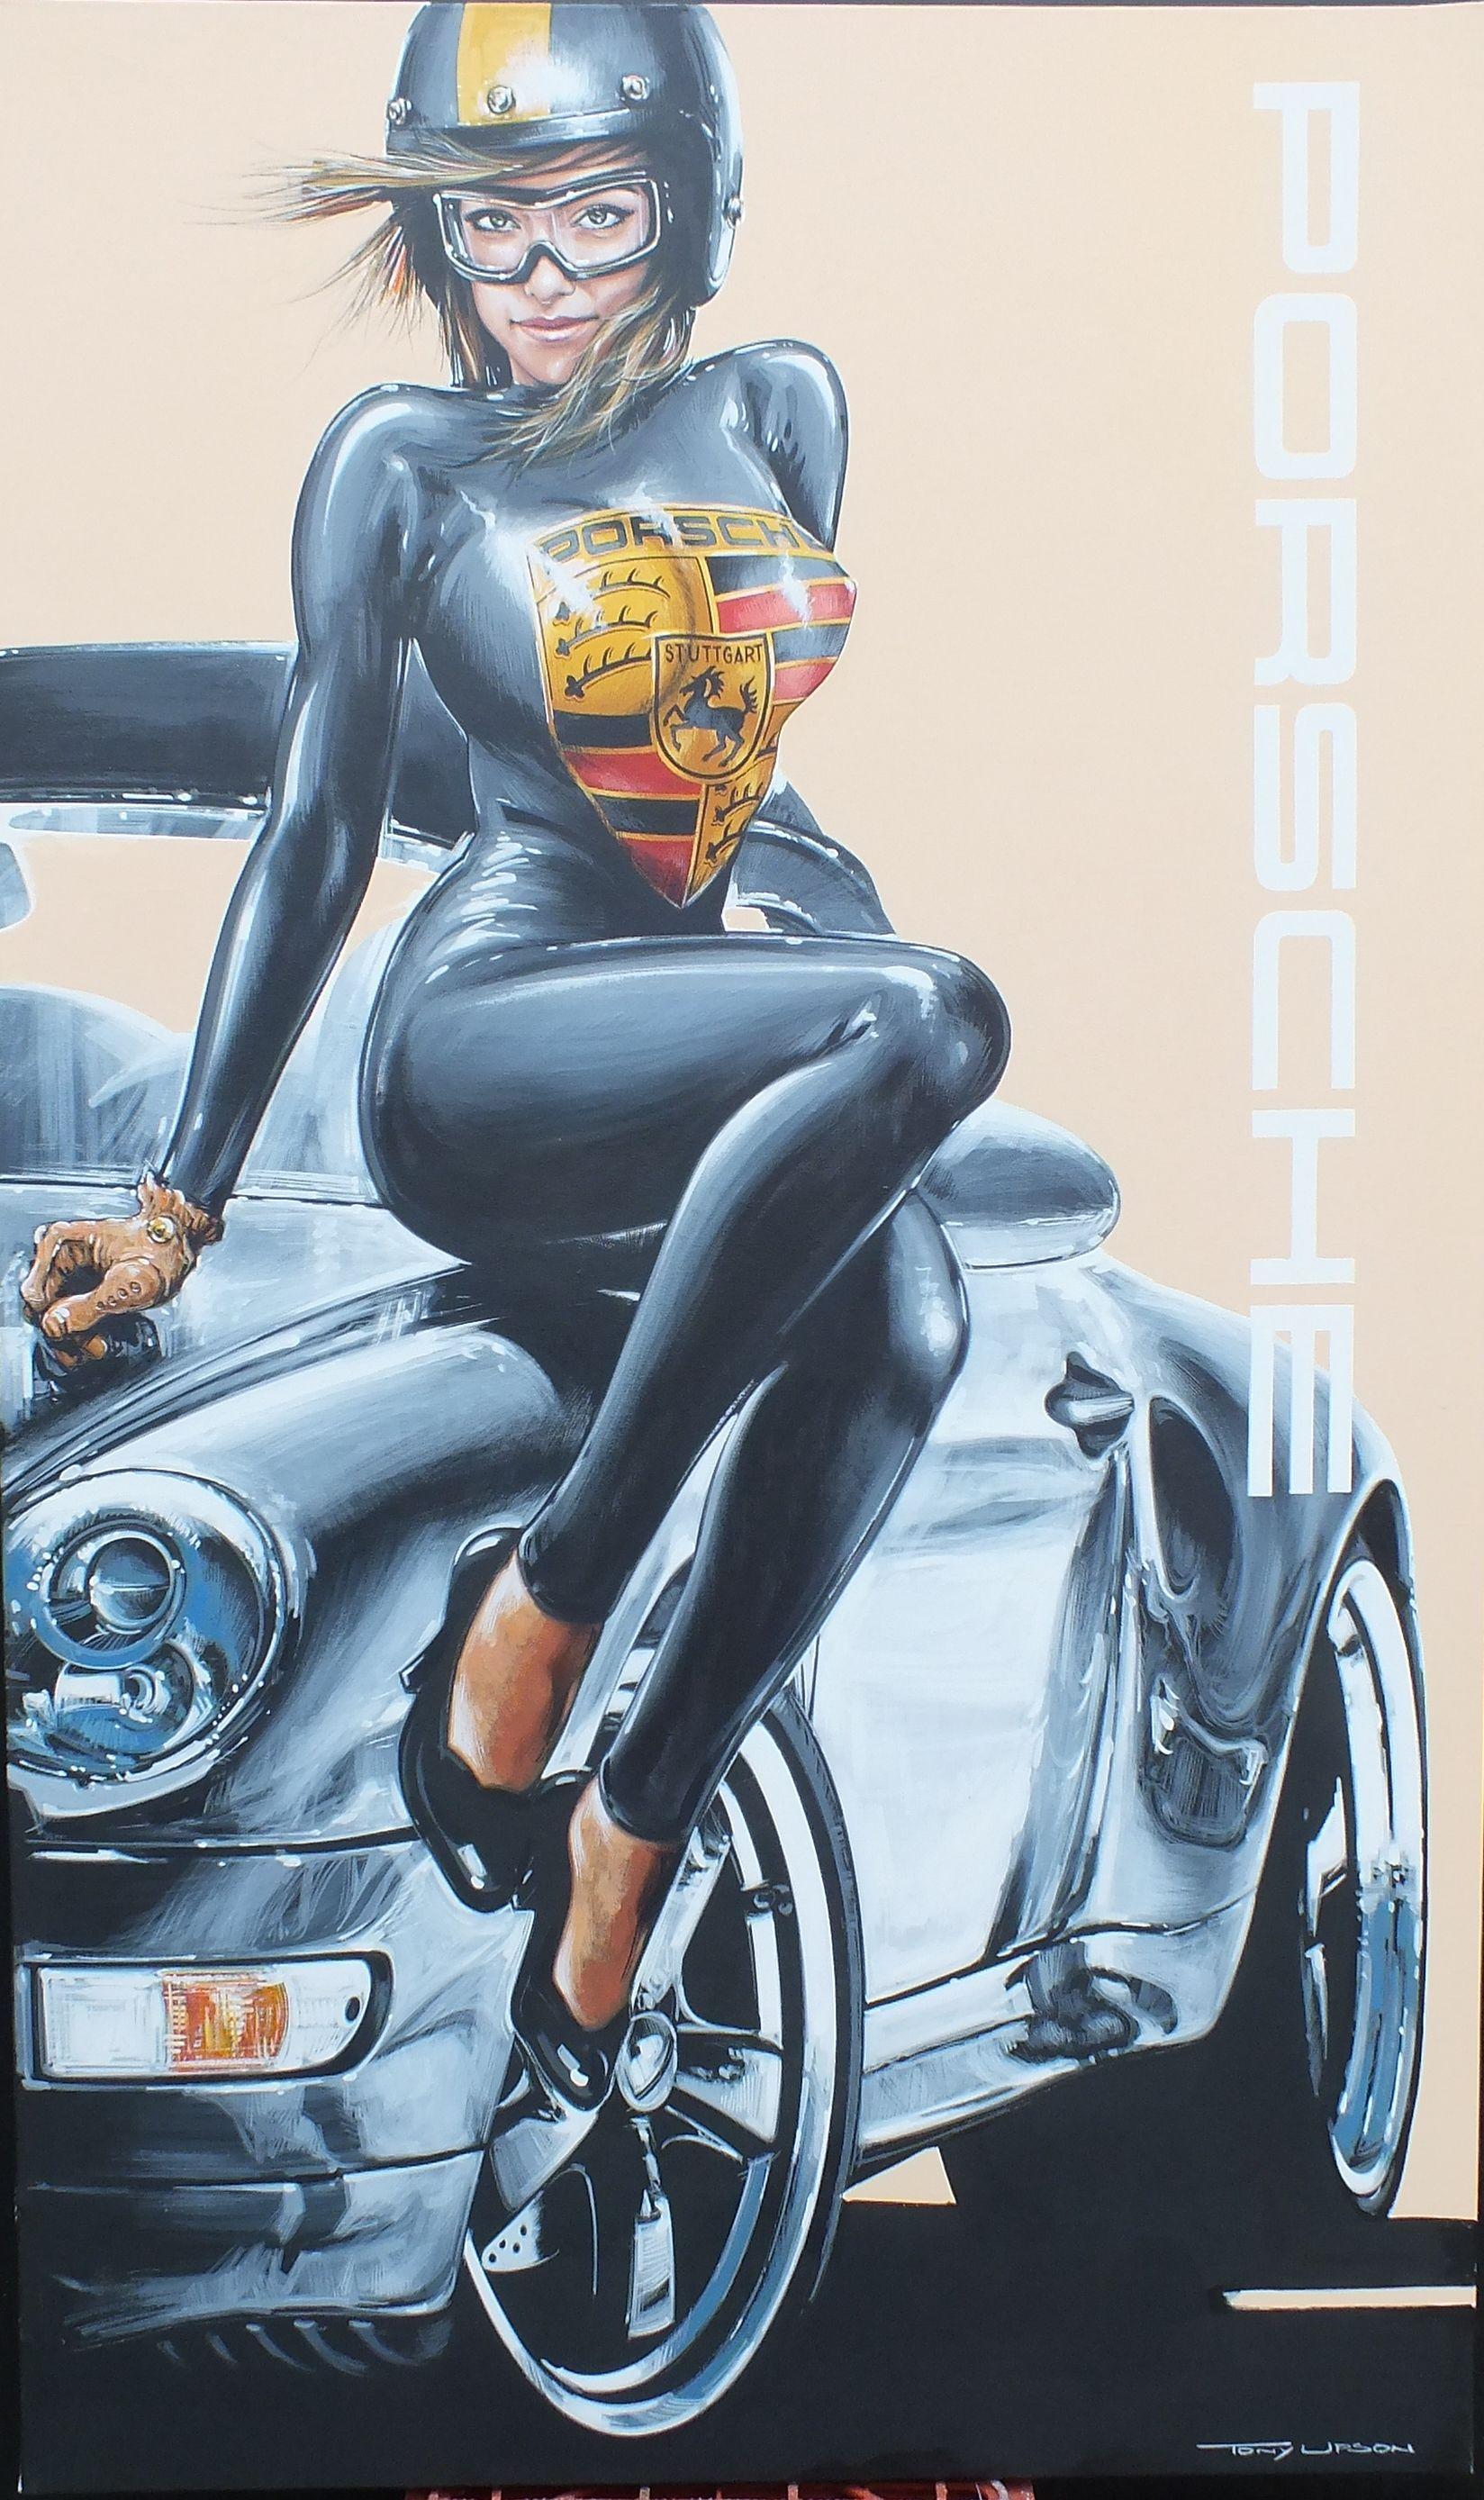 Porschegirl Carroceria Coche Equipamiento Boot 2016 Elegancia Deportividad Sport Avensis Auto Zeichnungen Automobil Autos